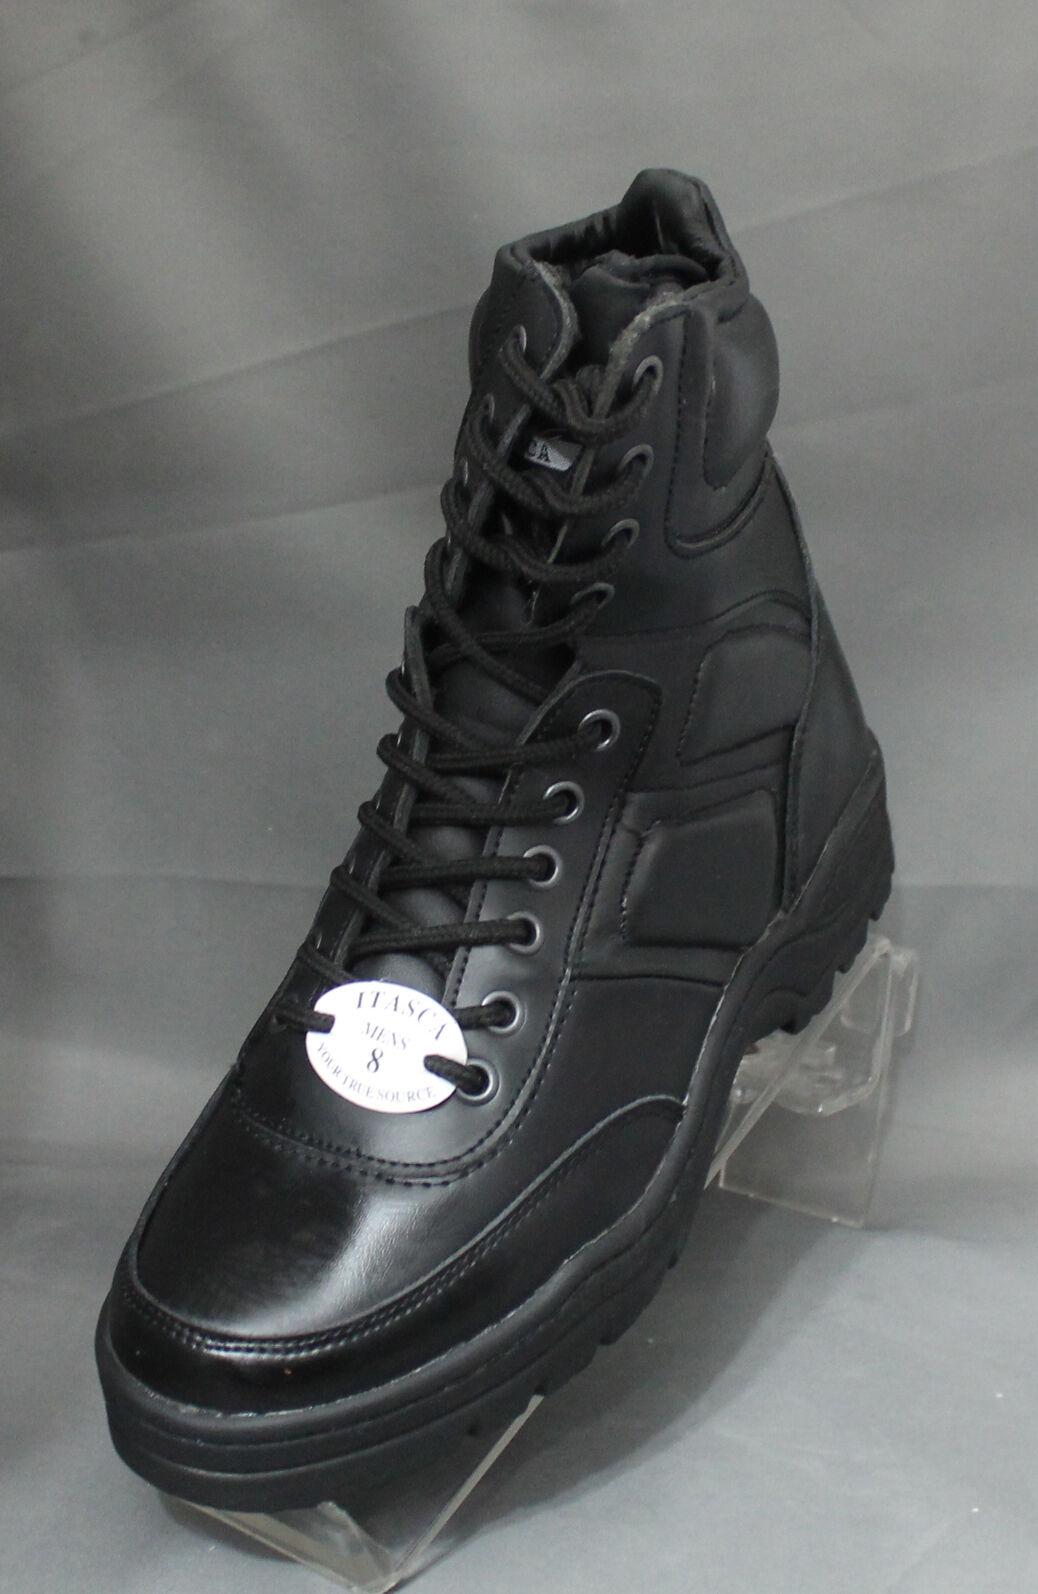 Mens Itasca Trident Boot - 509840